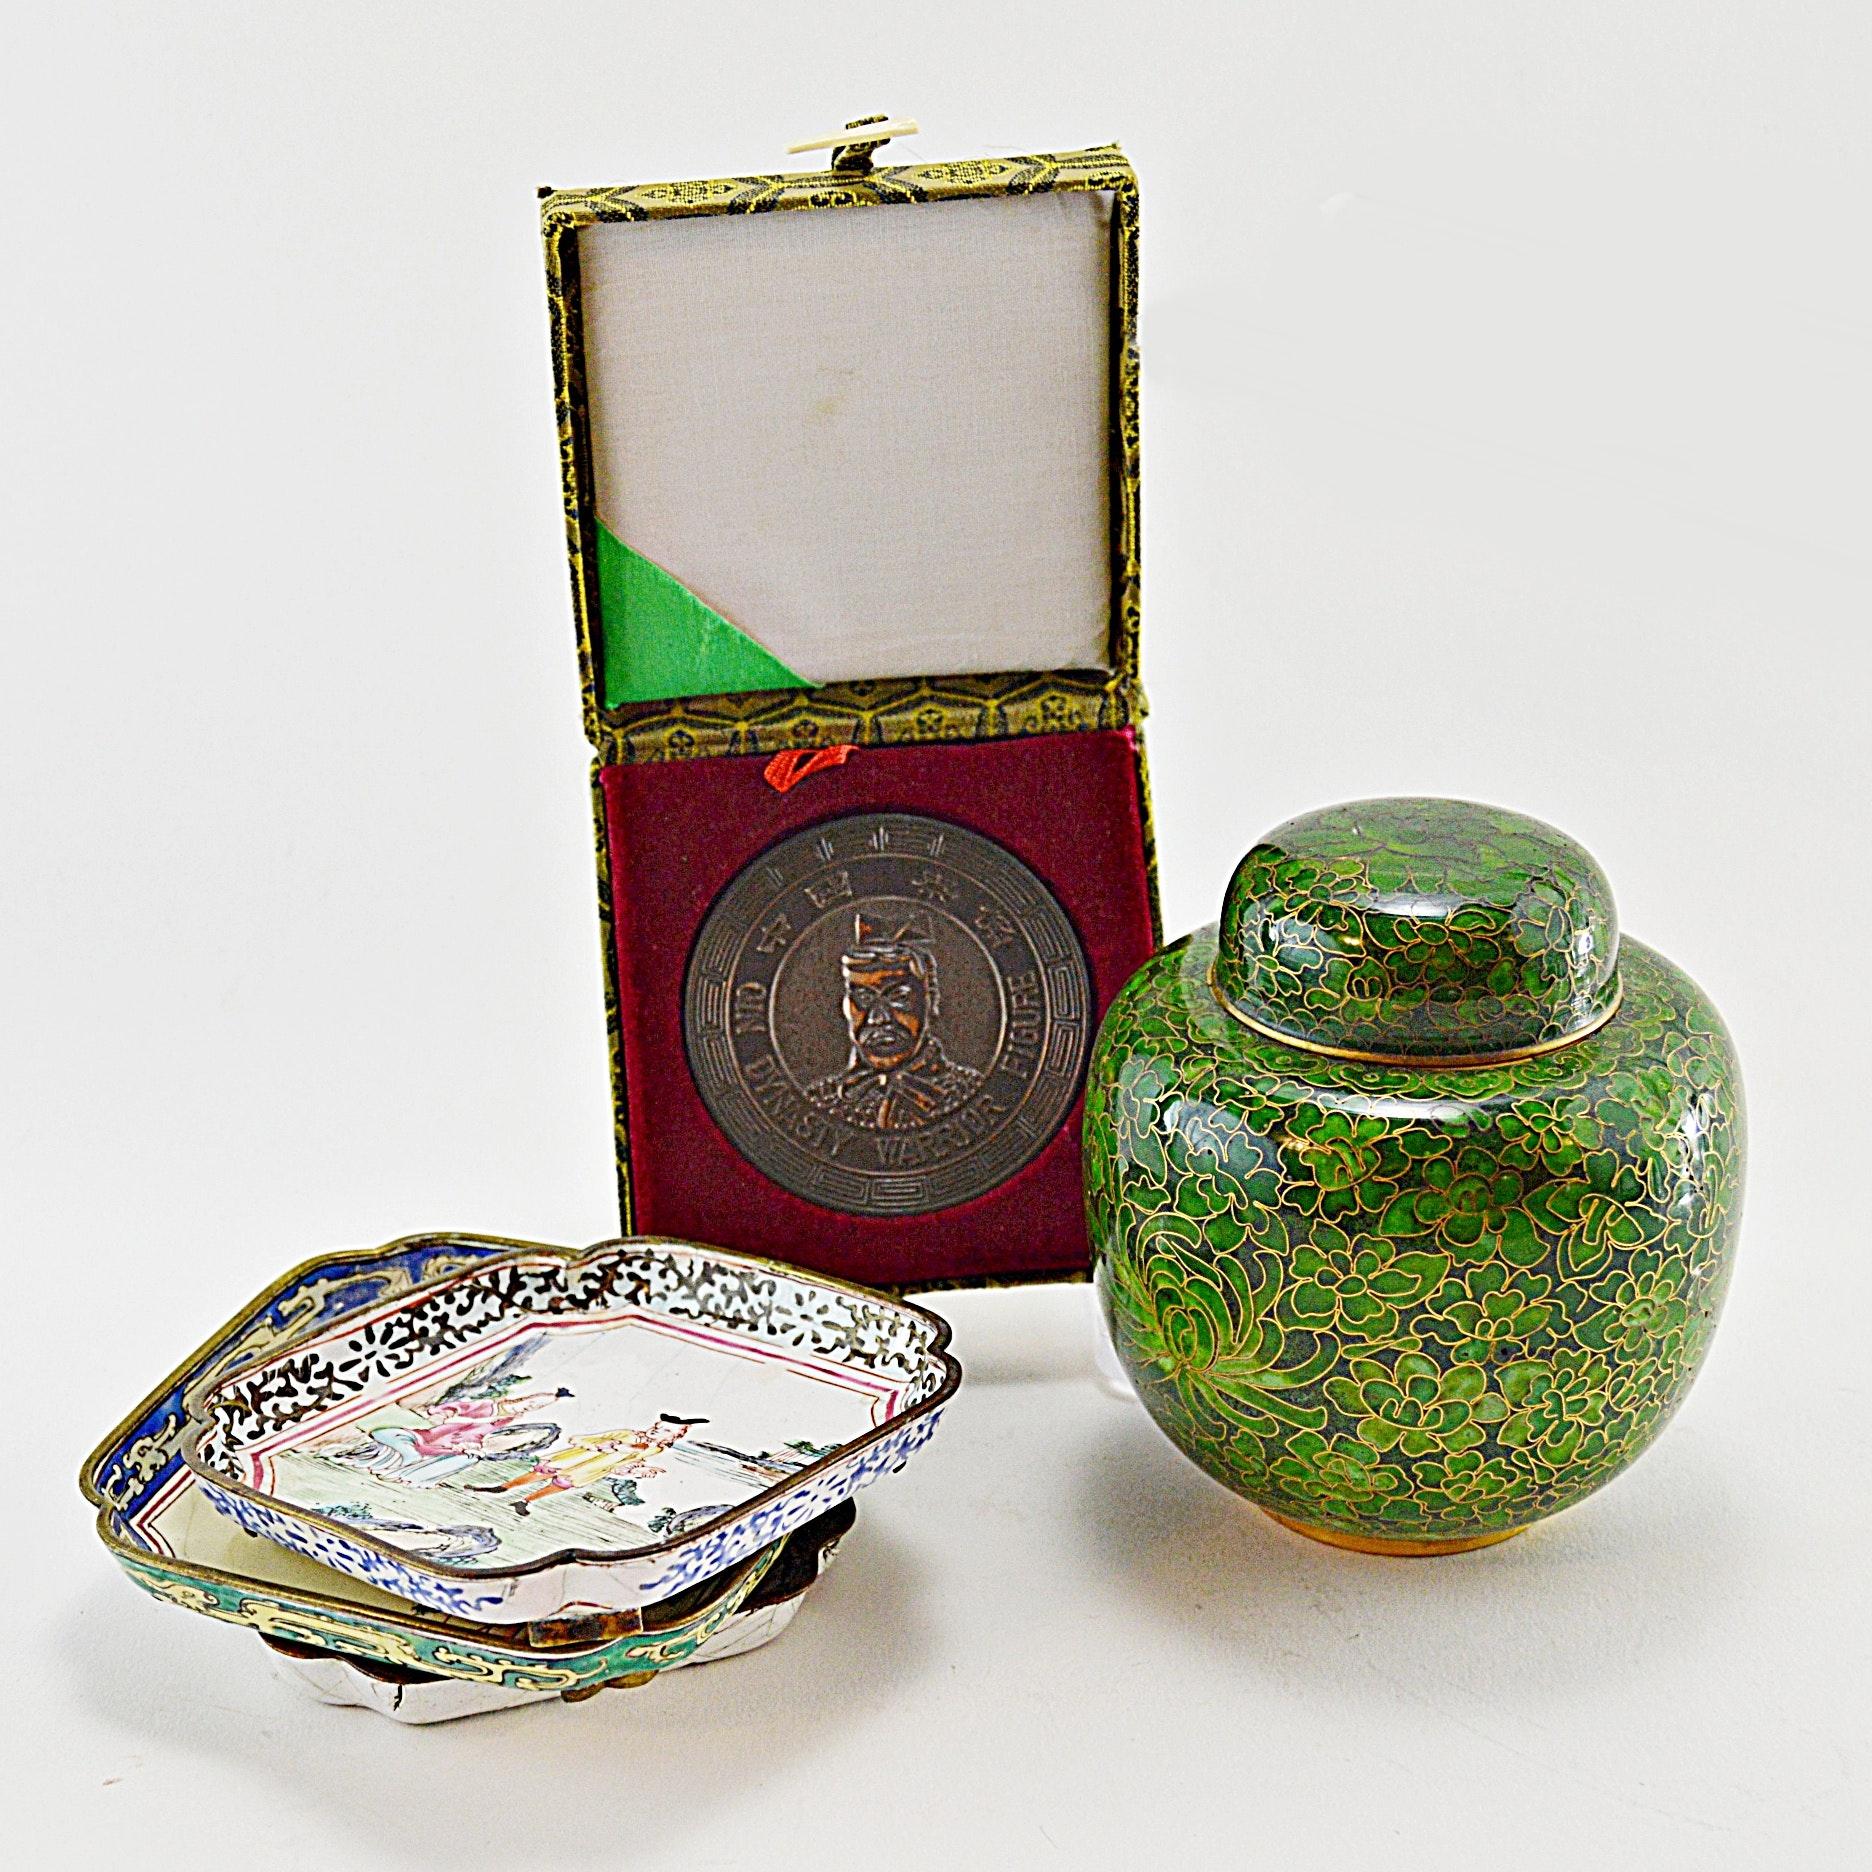 Asian Cloisonné Vase, Enamelware Dishes and Medallion